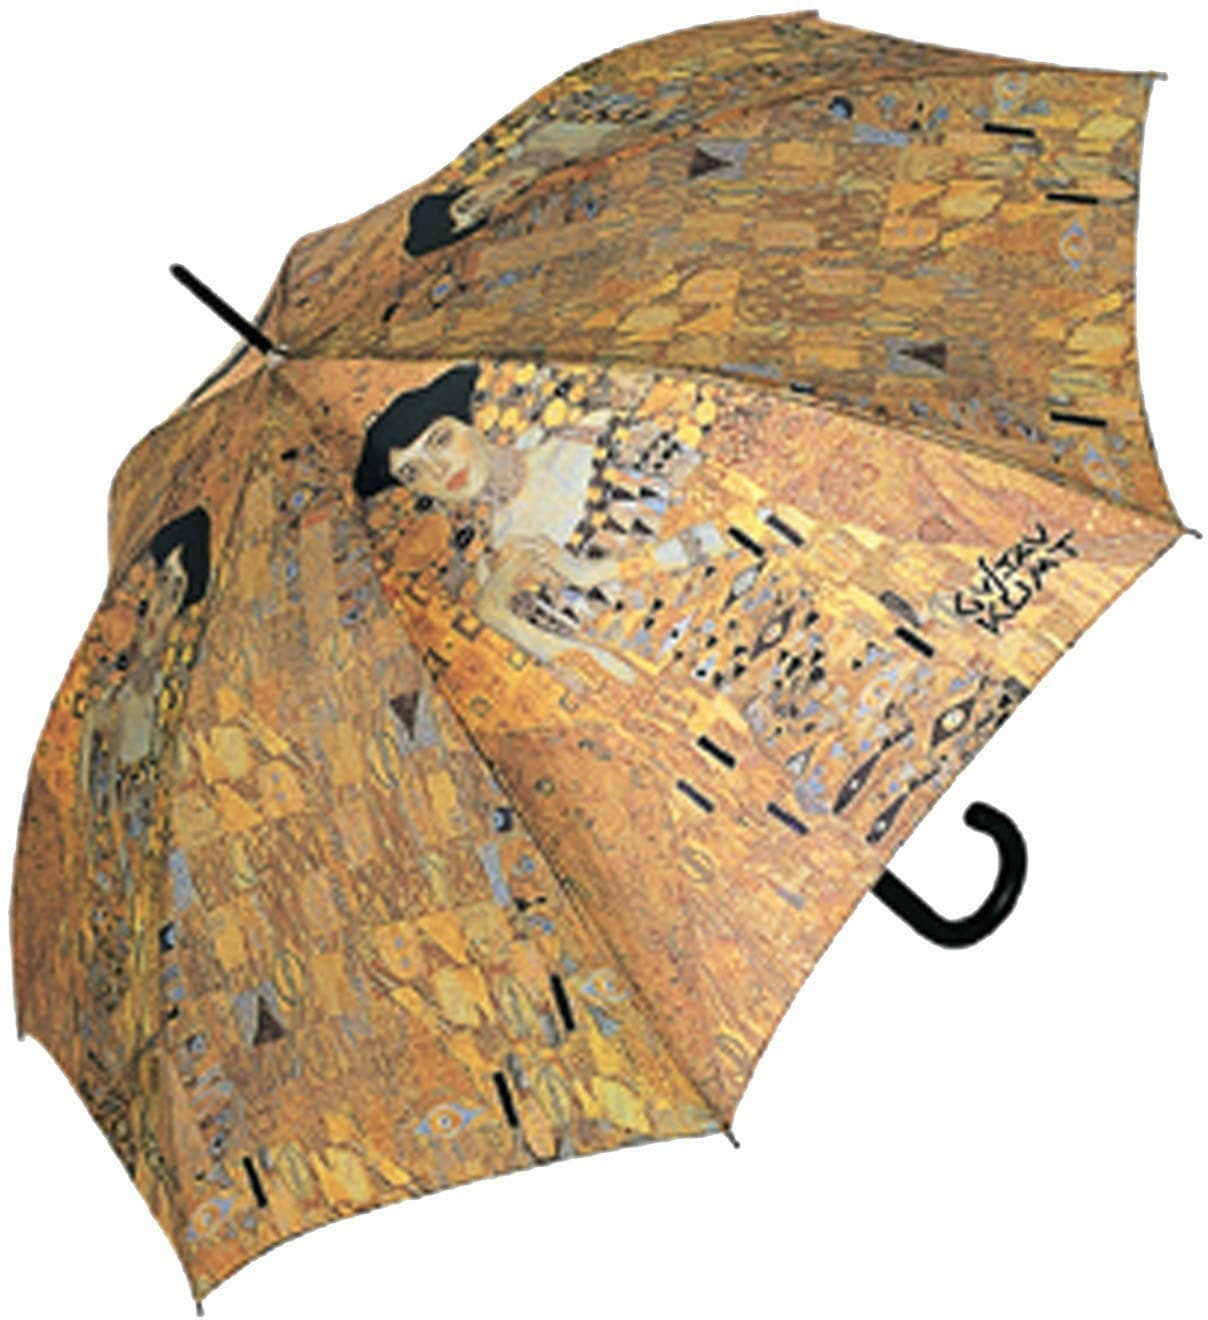 doppler® Regenschirm, »Stockschirm LS Automatik Adele« | Accessoires > Regenschirme > Stockschirme | Polyester | DOPPLER